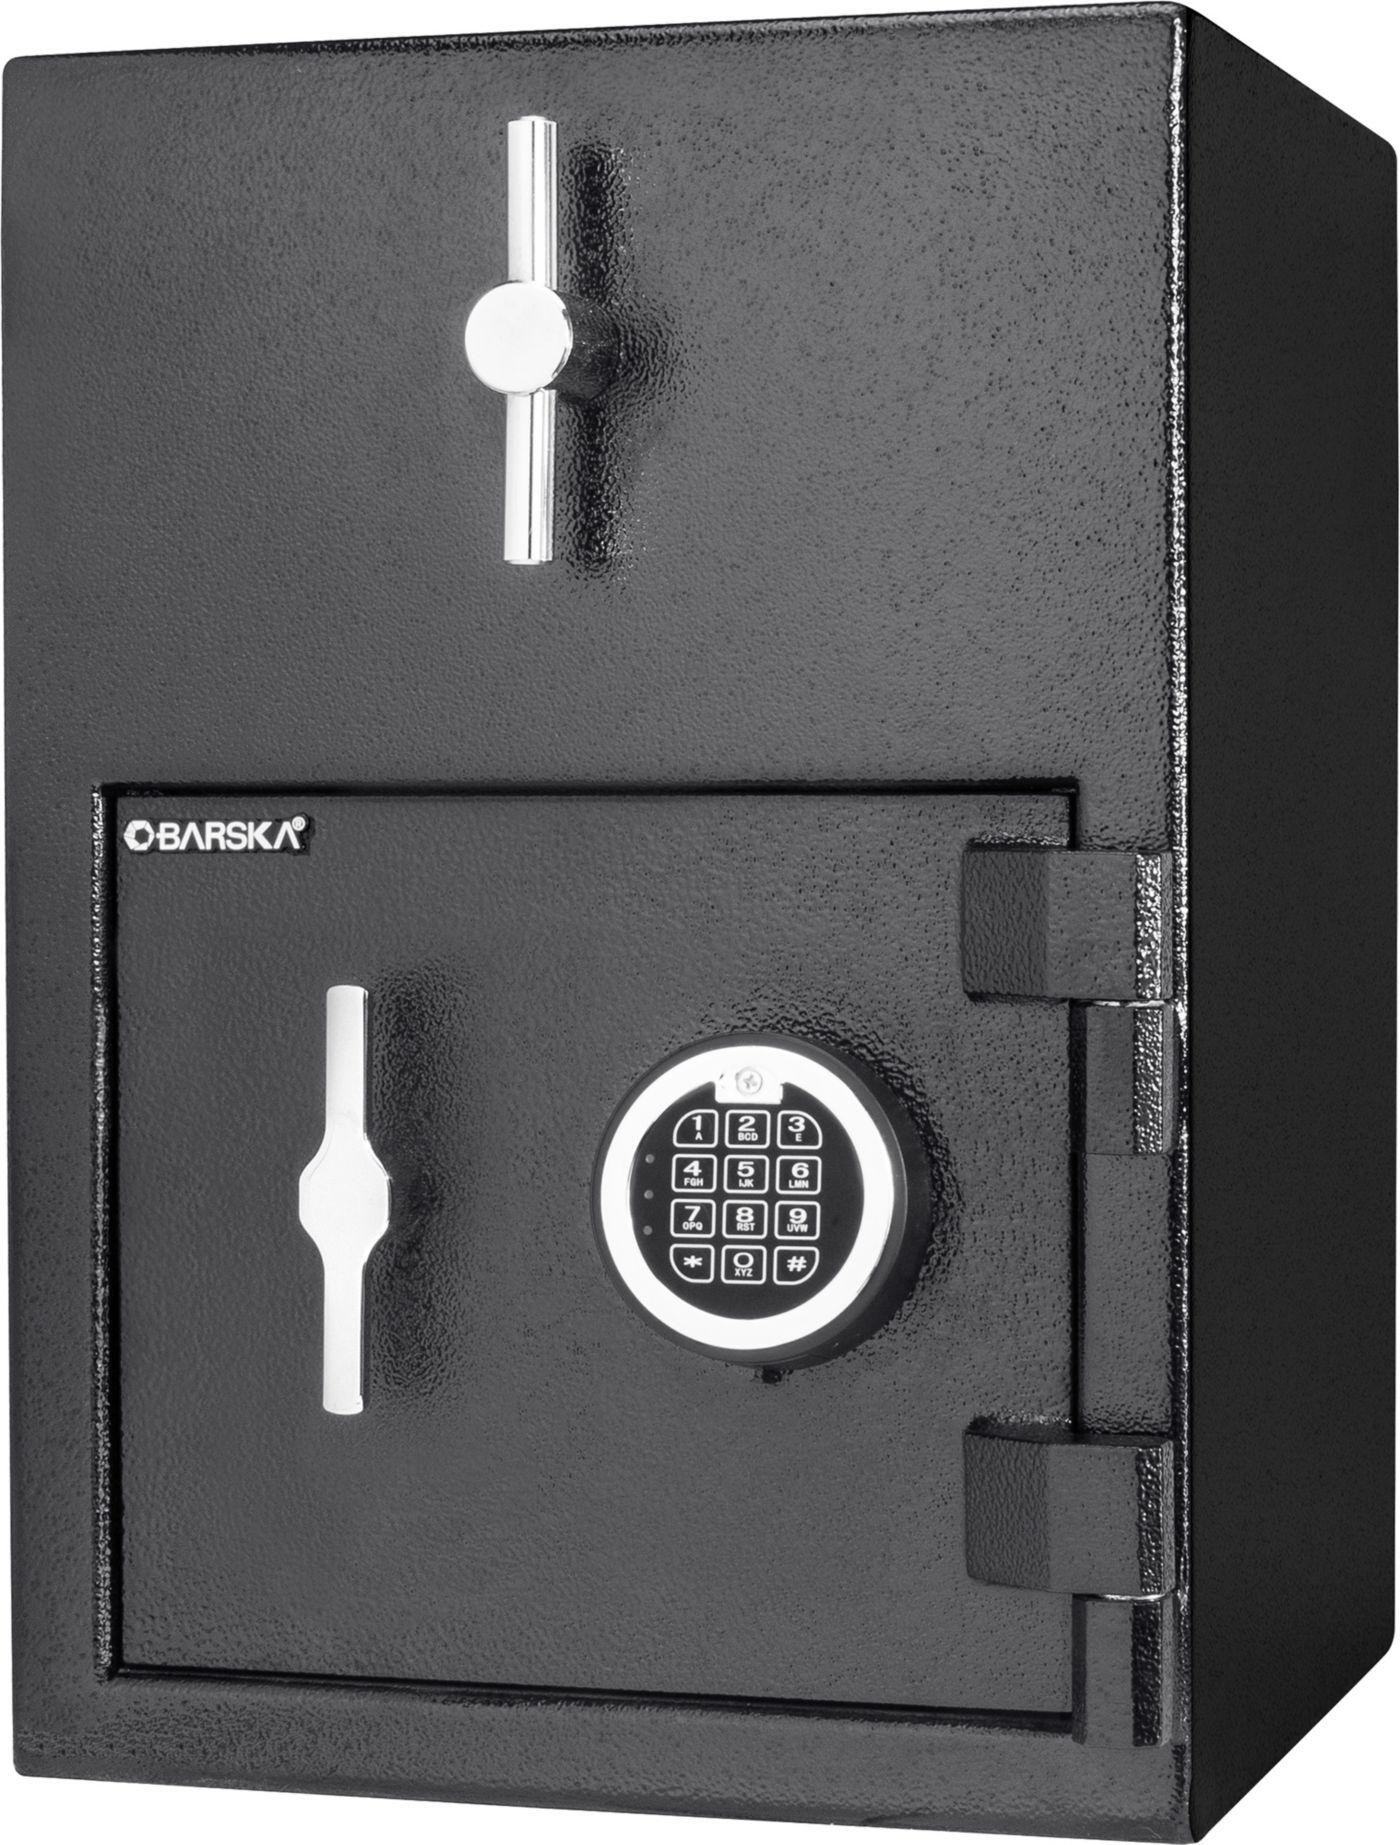 Barska Rotary Hopper Depository Safe with Keypad Lock